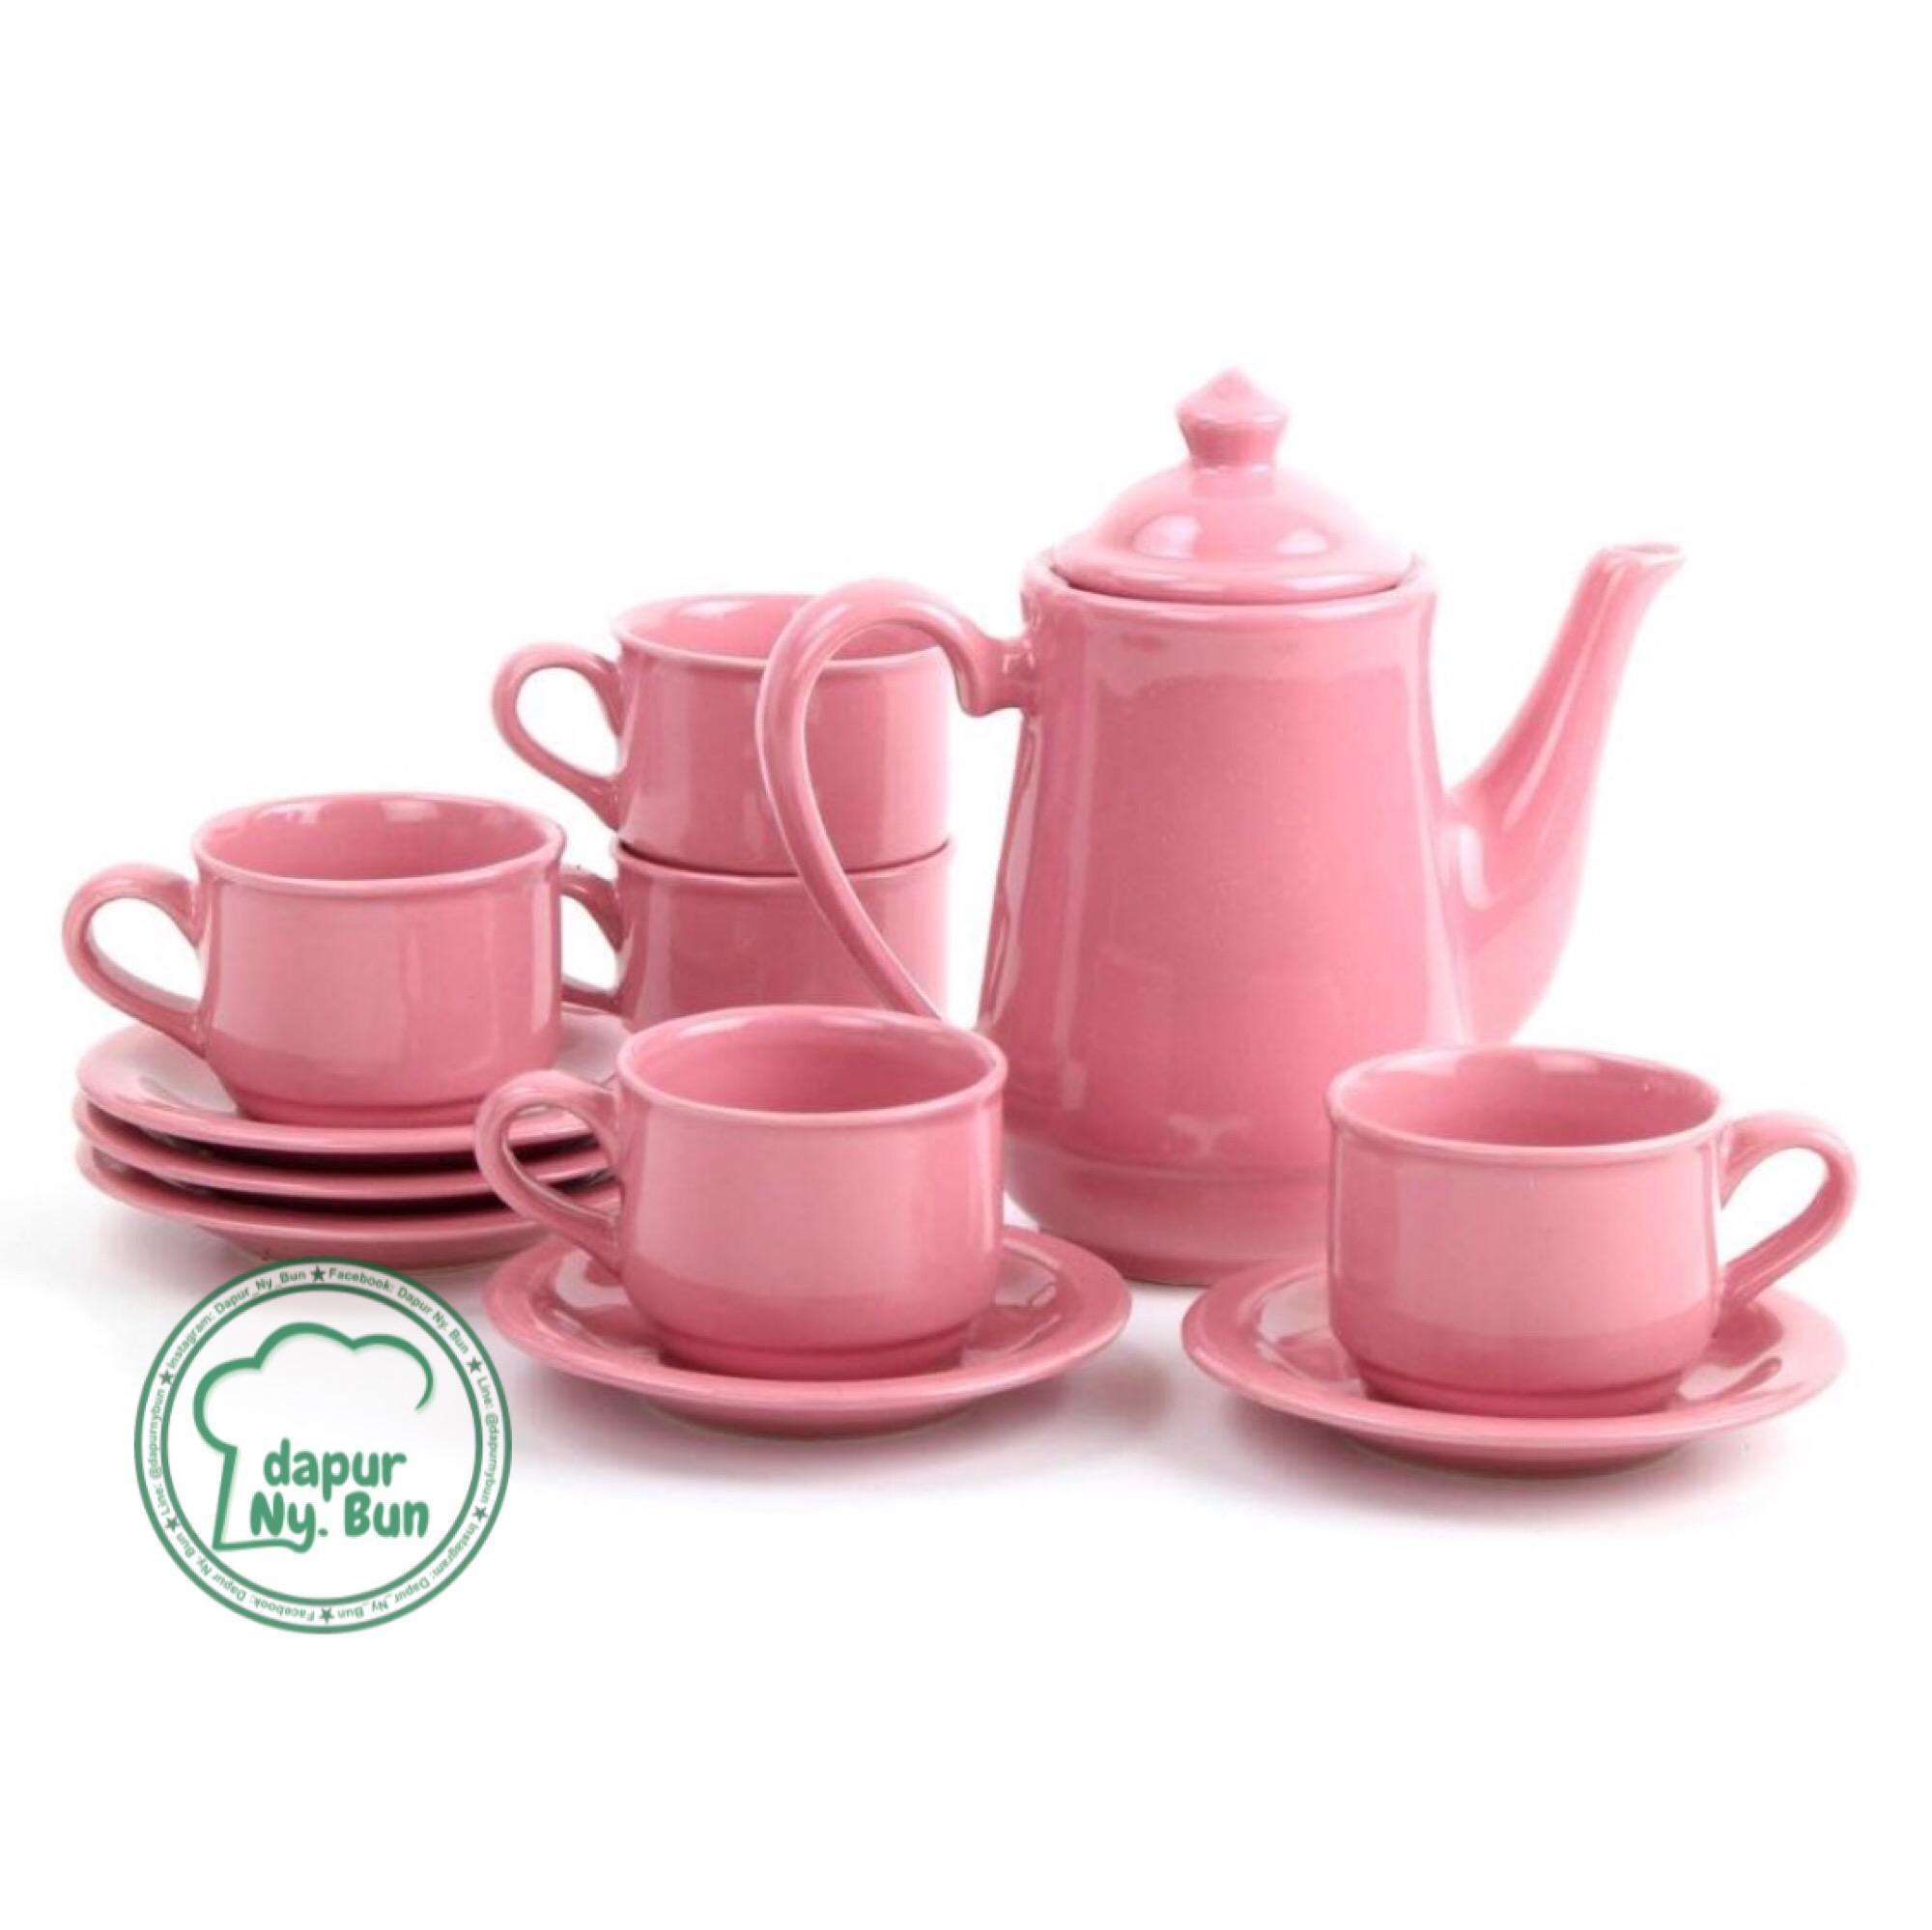 Tea Set Nikura / Coffee Set / Teko + Tutup / 5 Cangkir + 5 Saucer